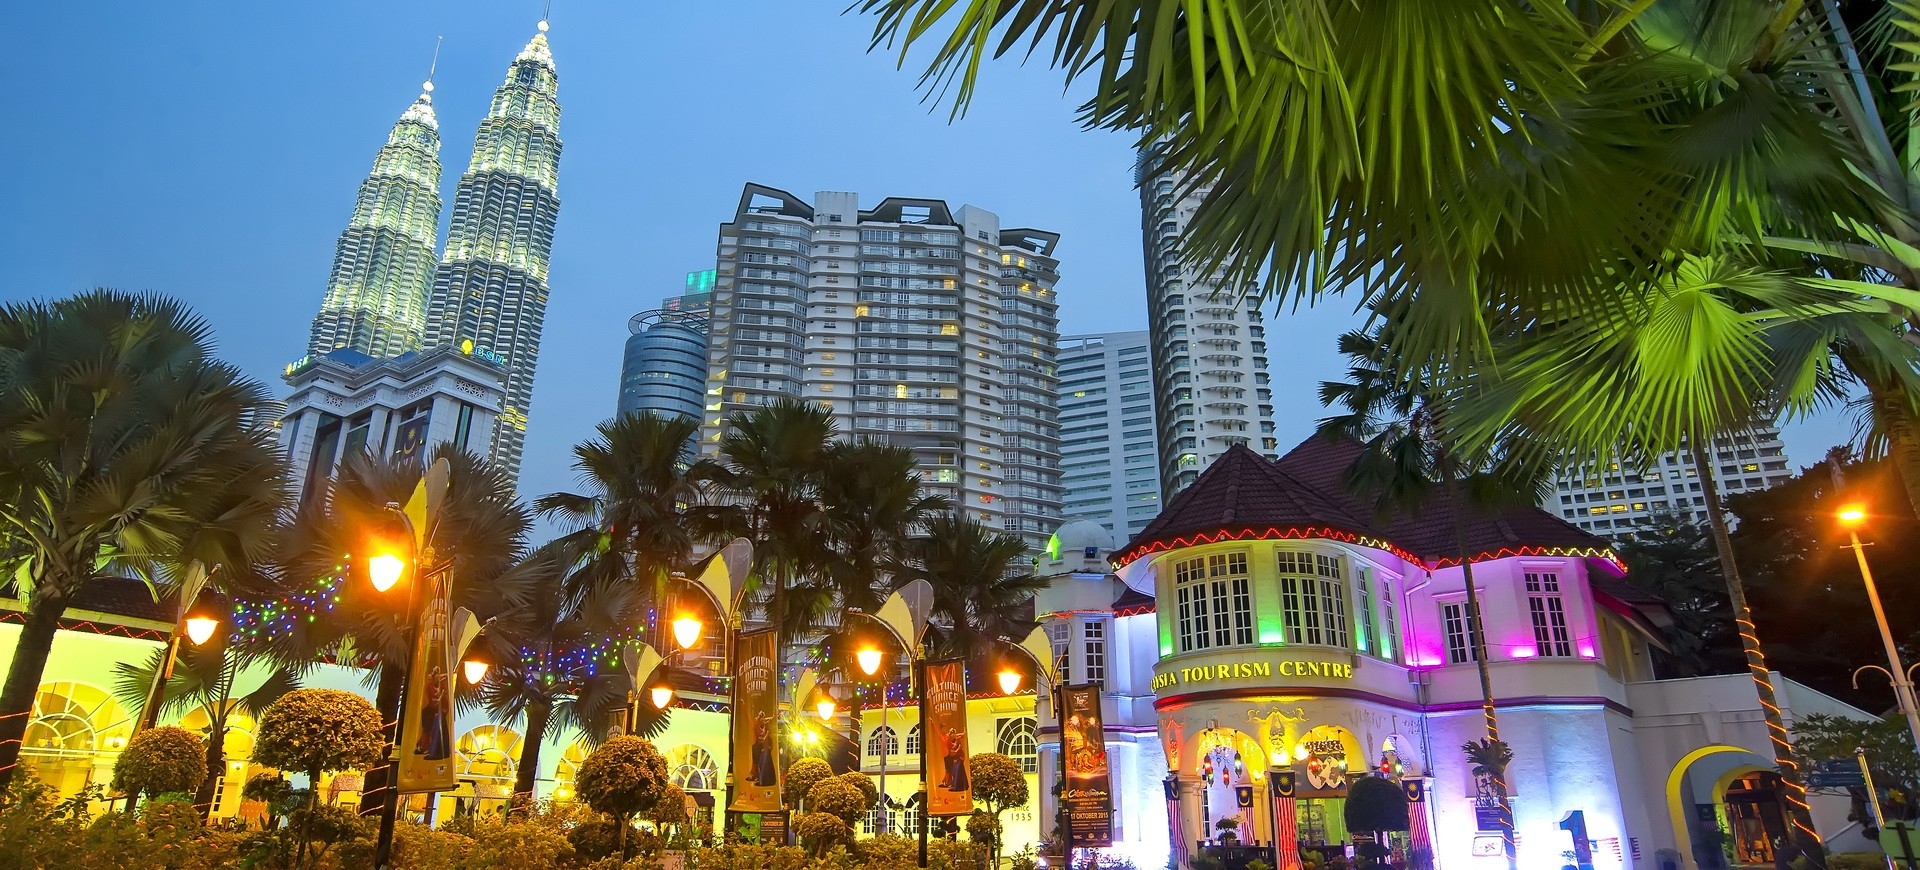 Malaisie Kuala Lumpur Tours Petronas Twin Towers by night